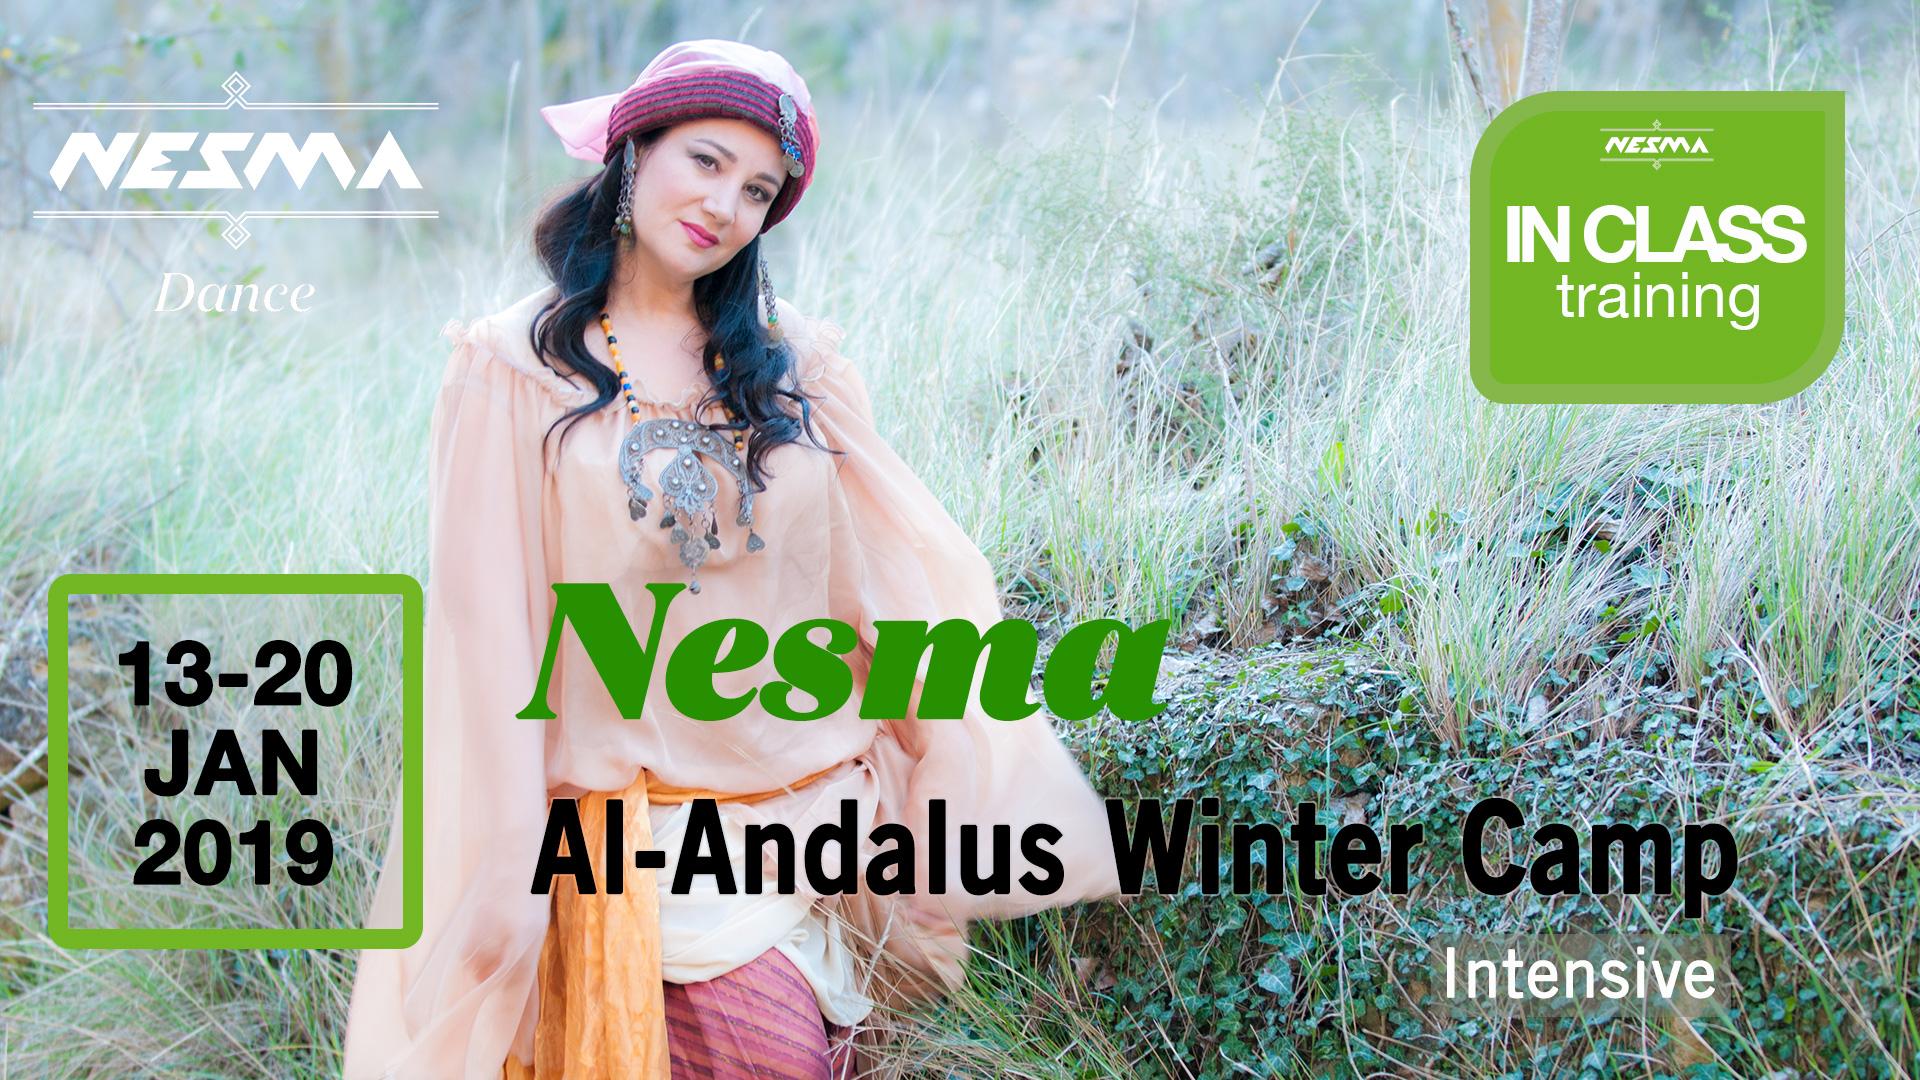 Al-Andalus Winter Camp 'Intensive'